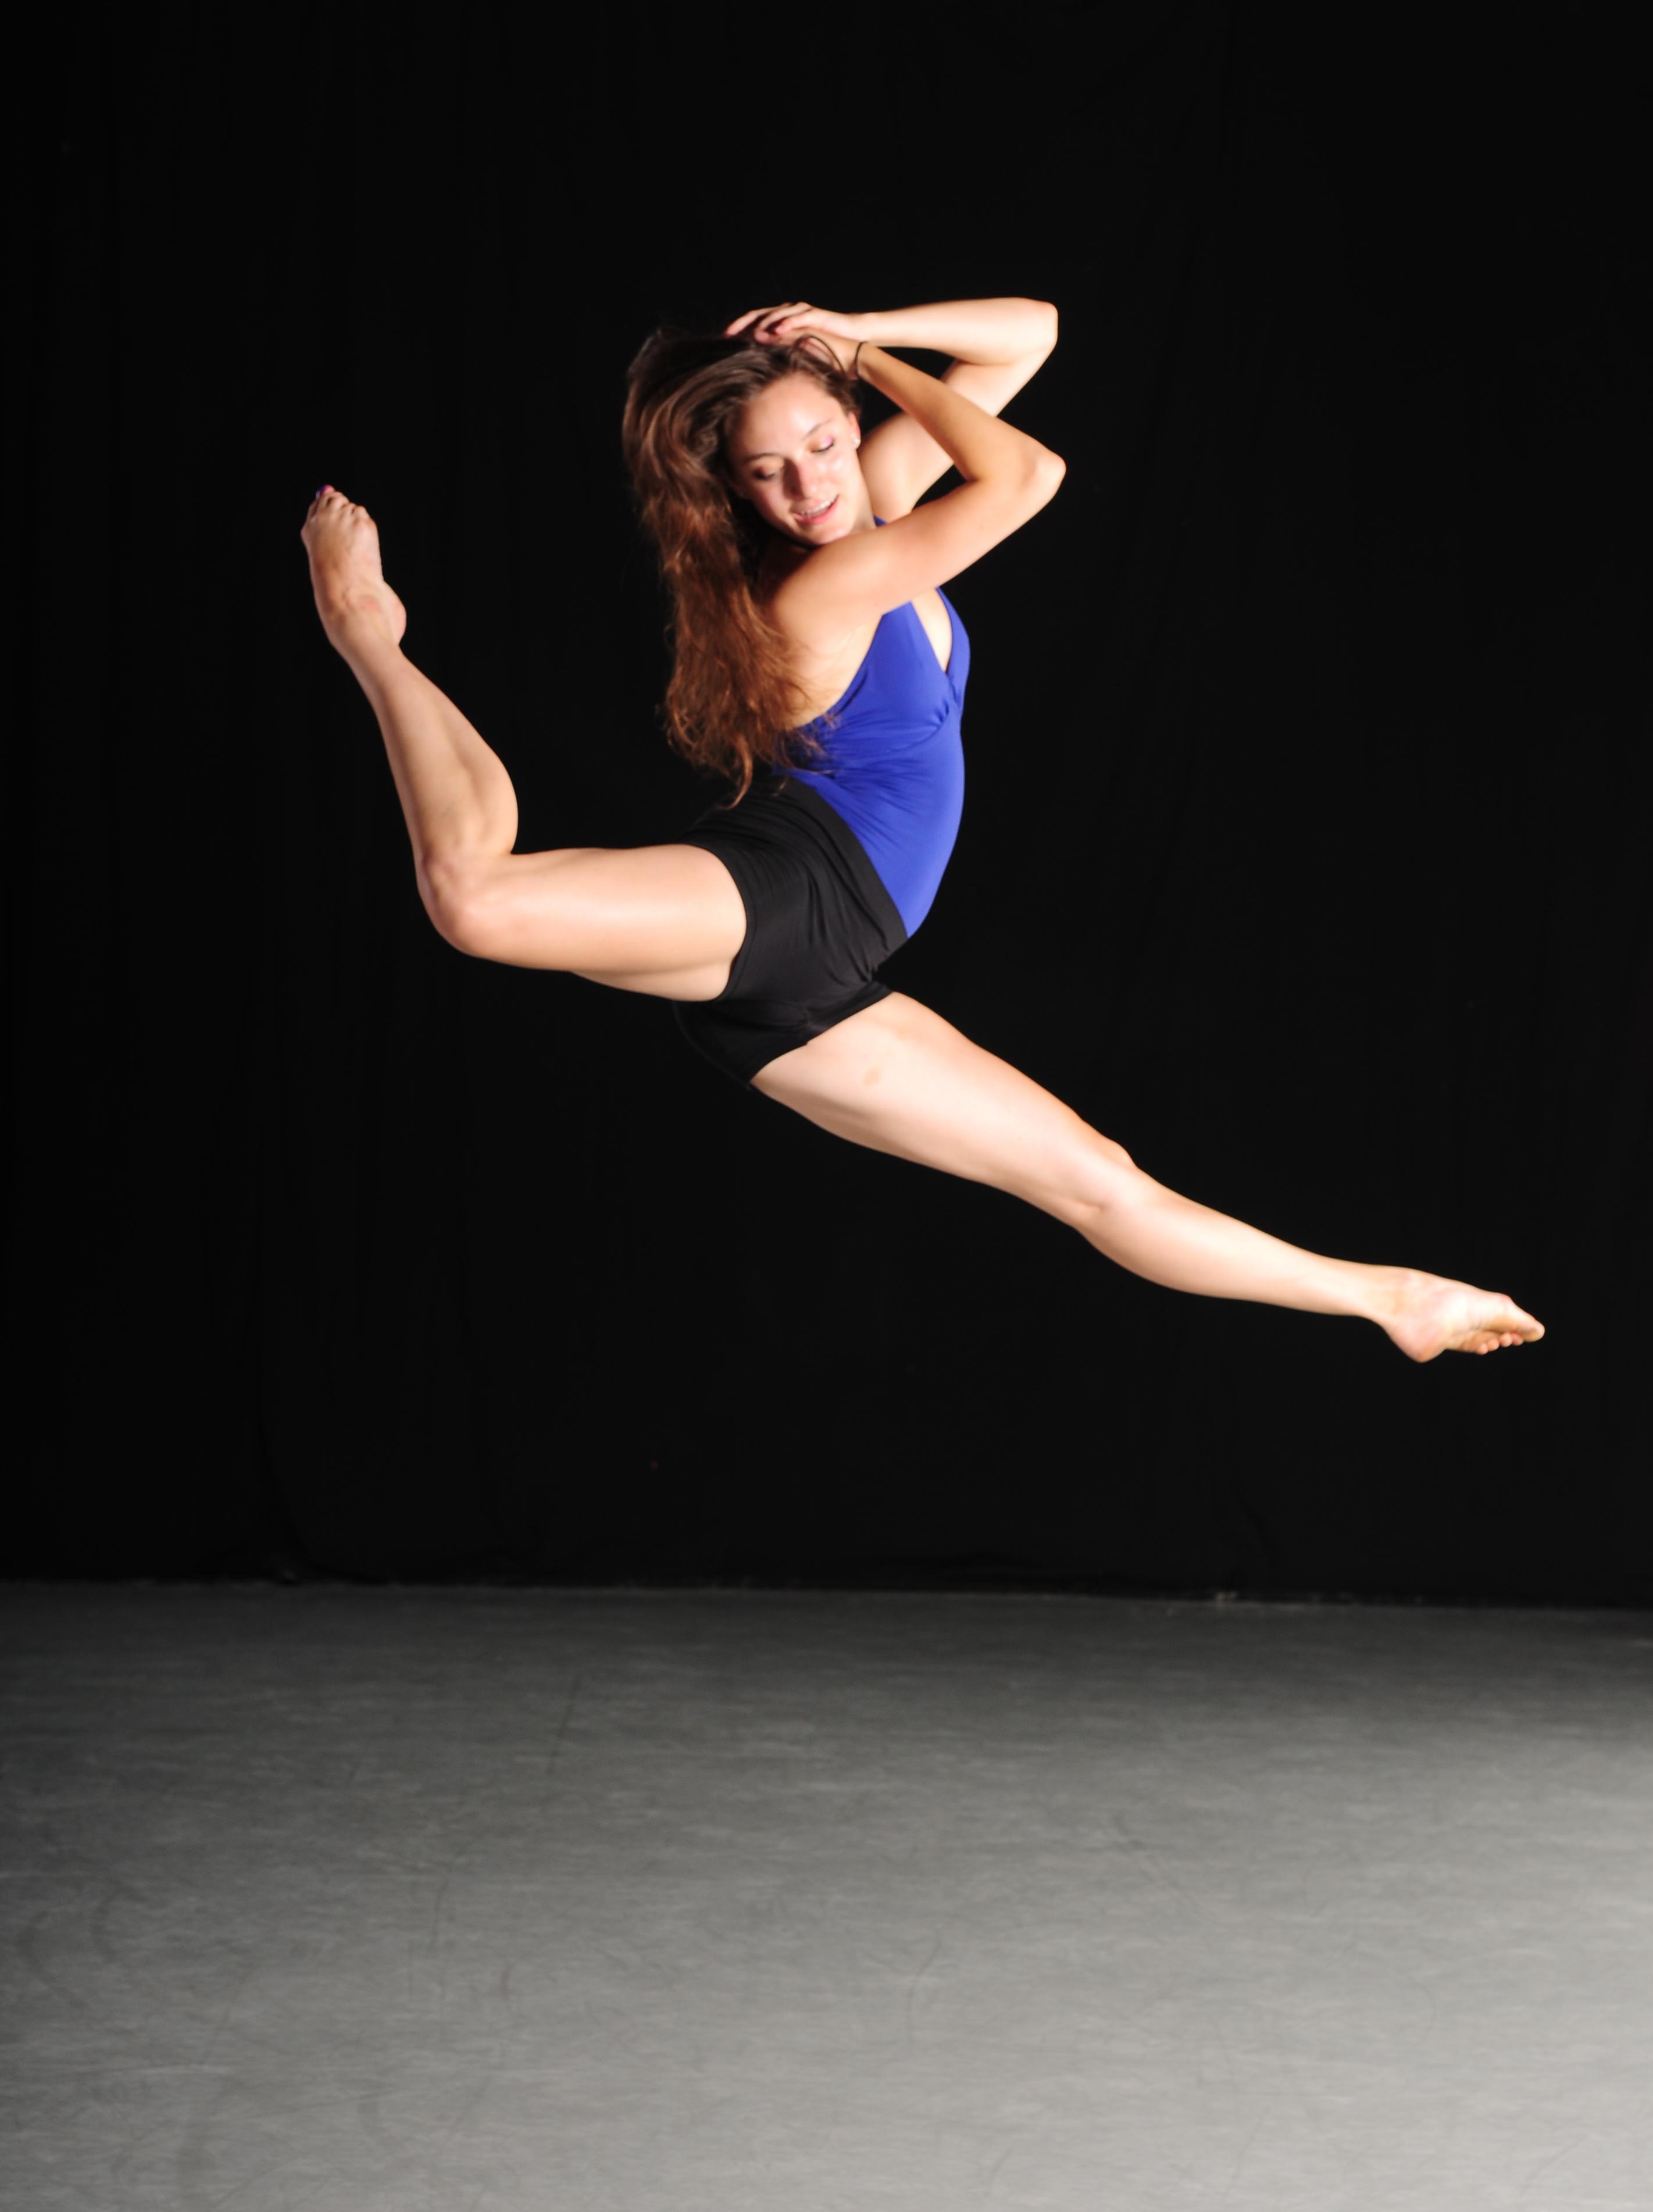 Katie Burks ©Grant Halverson